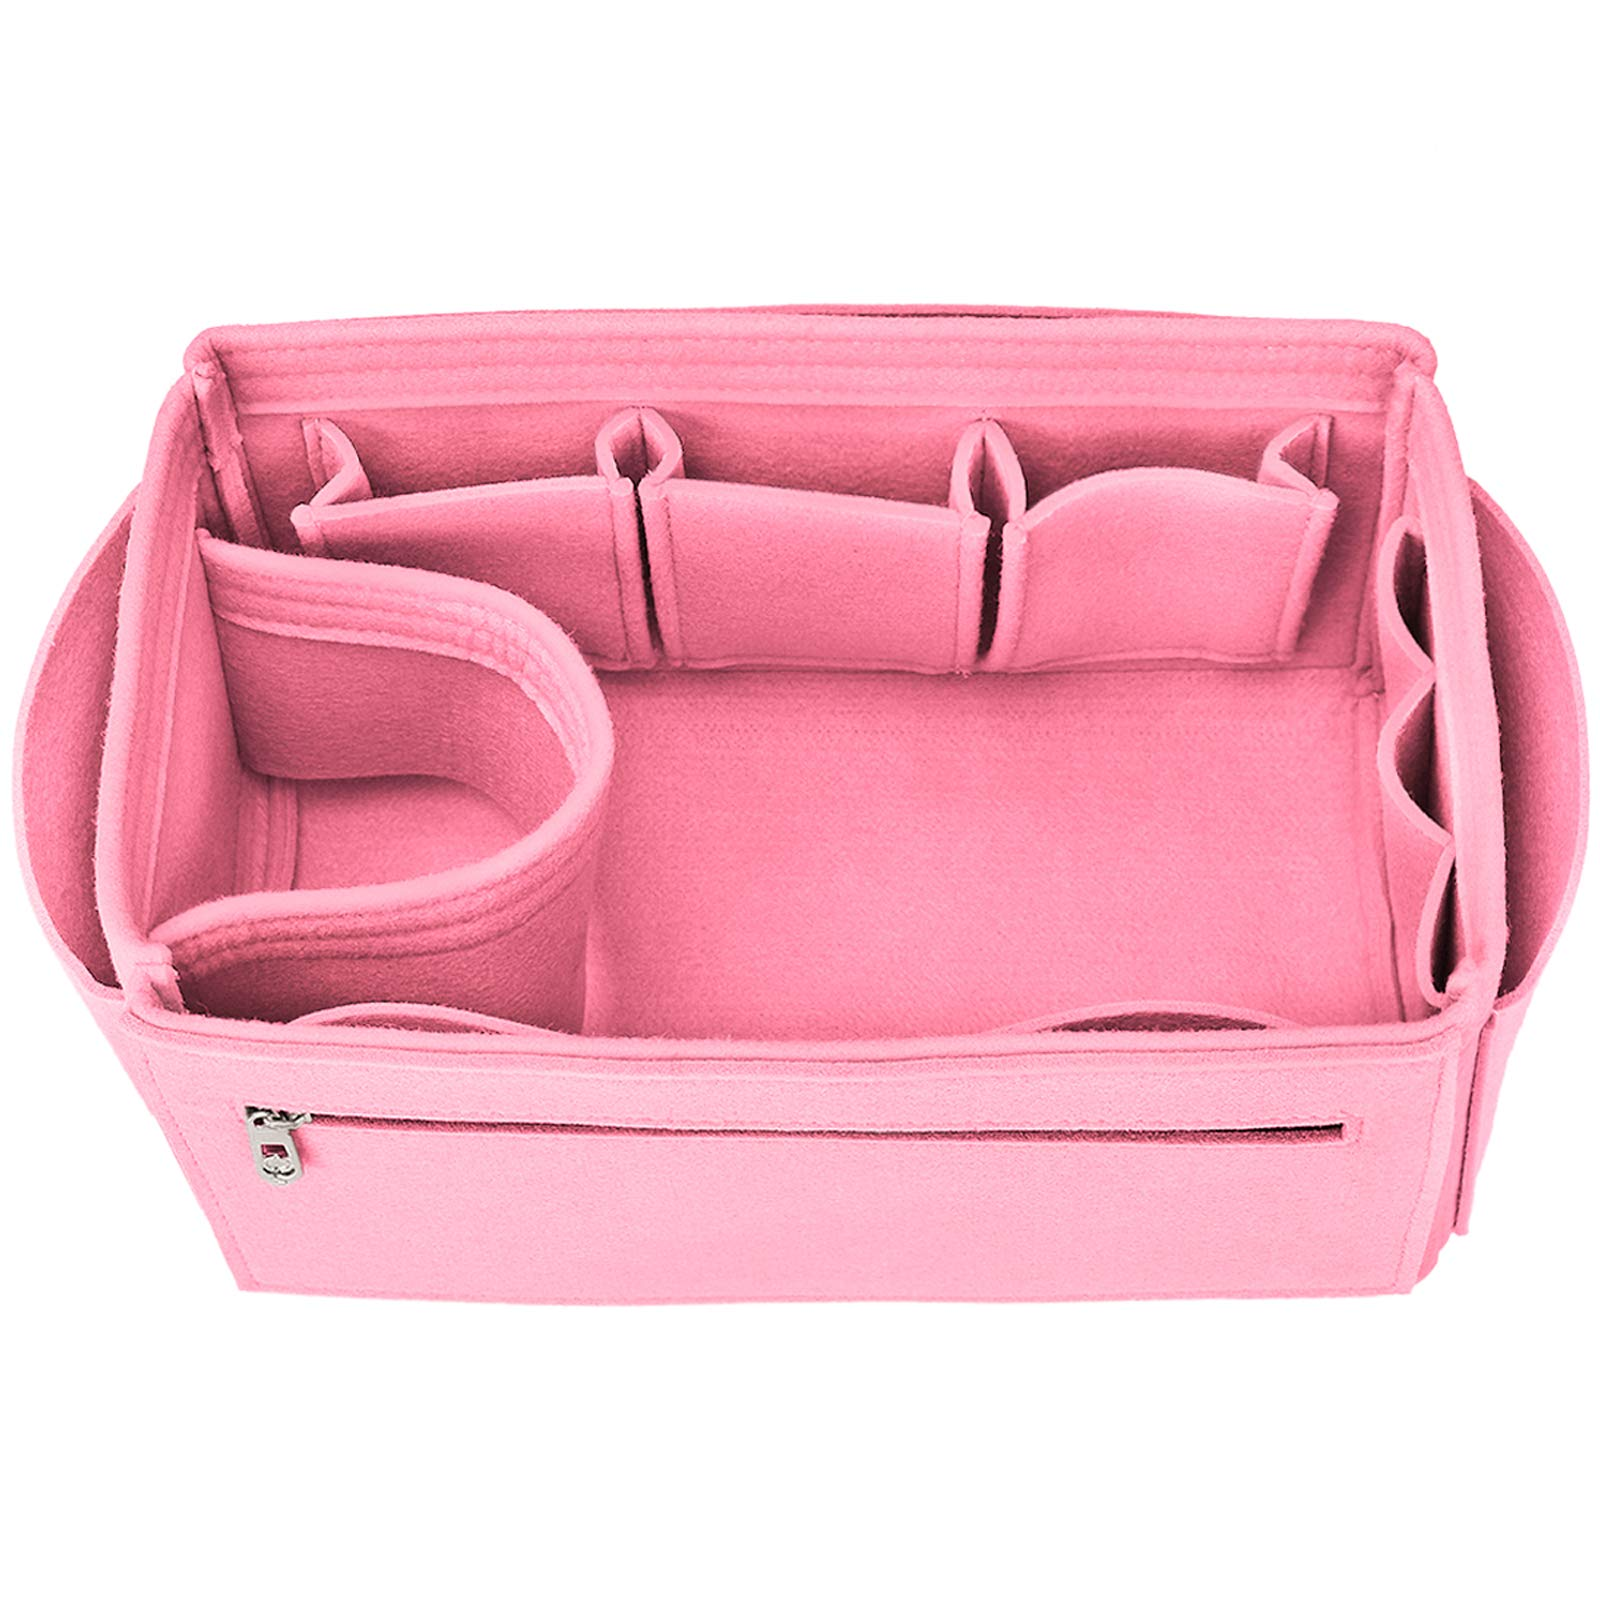 Hokeeper Felt Purse Insert Organizer, Handbag Organizer, Bag in Bag, Diaper Bag Organizer, Fit Speedy 25-40, Neverfull, 12 Pockets, 4 Sizes, 5 Colors